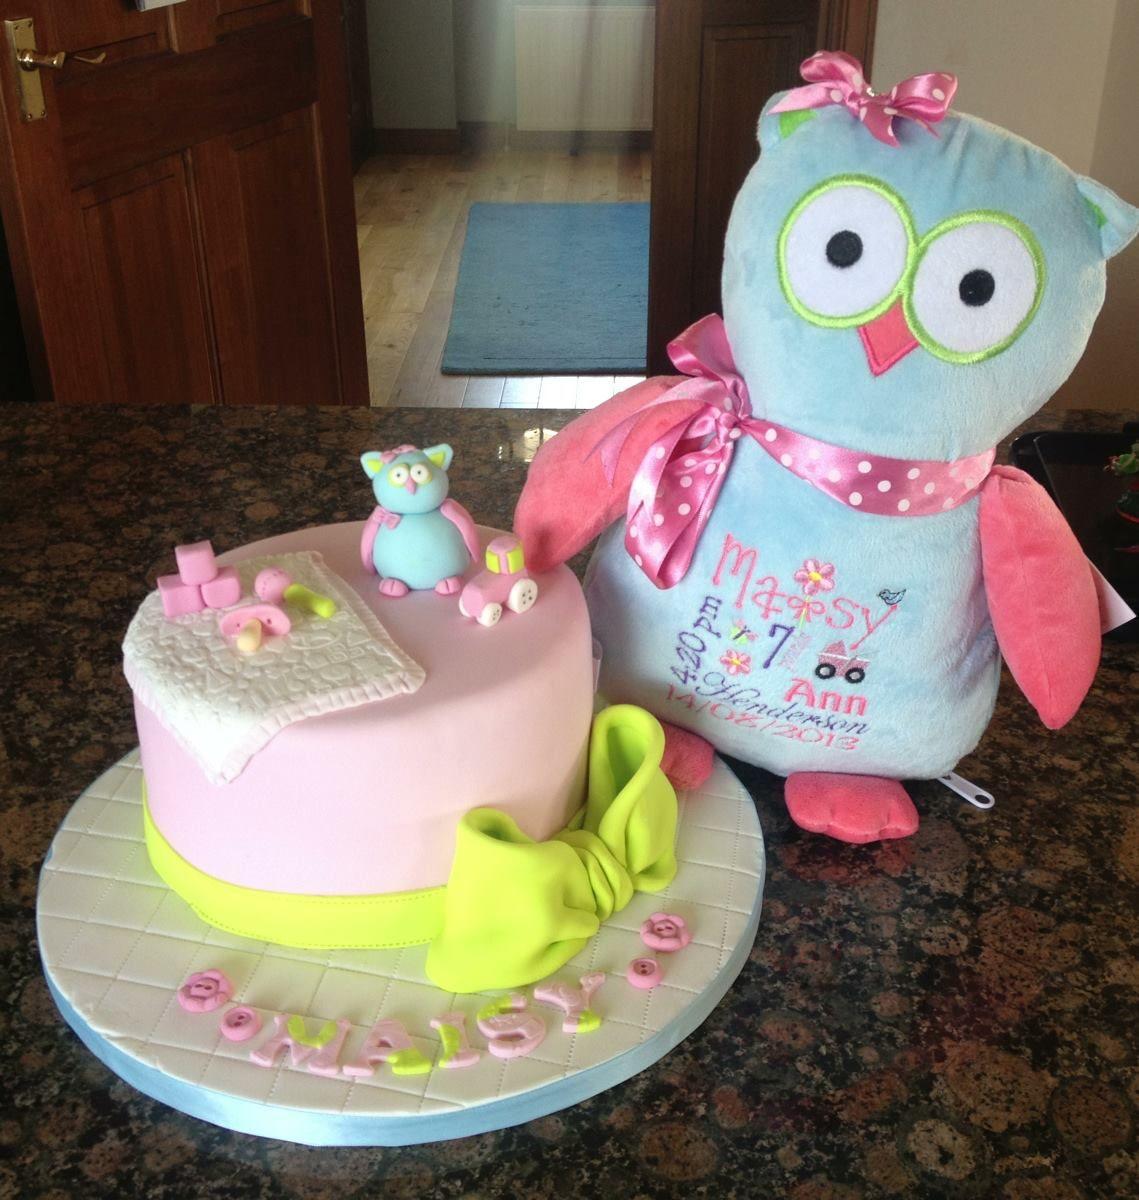 New Baby Cake Cubbie Owl Edible Cubbie Owl Topper Cakes